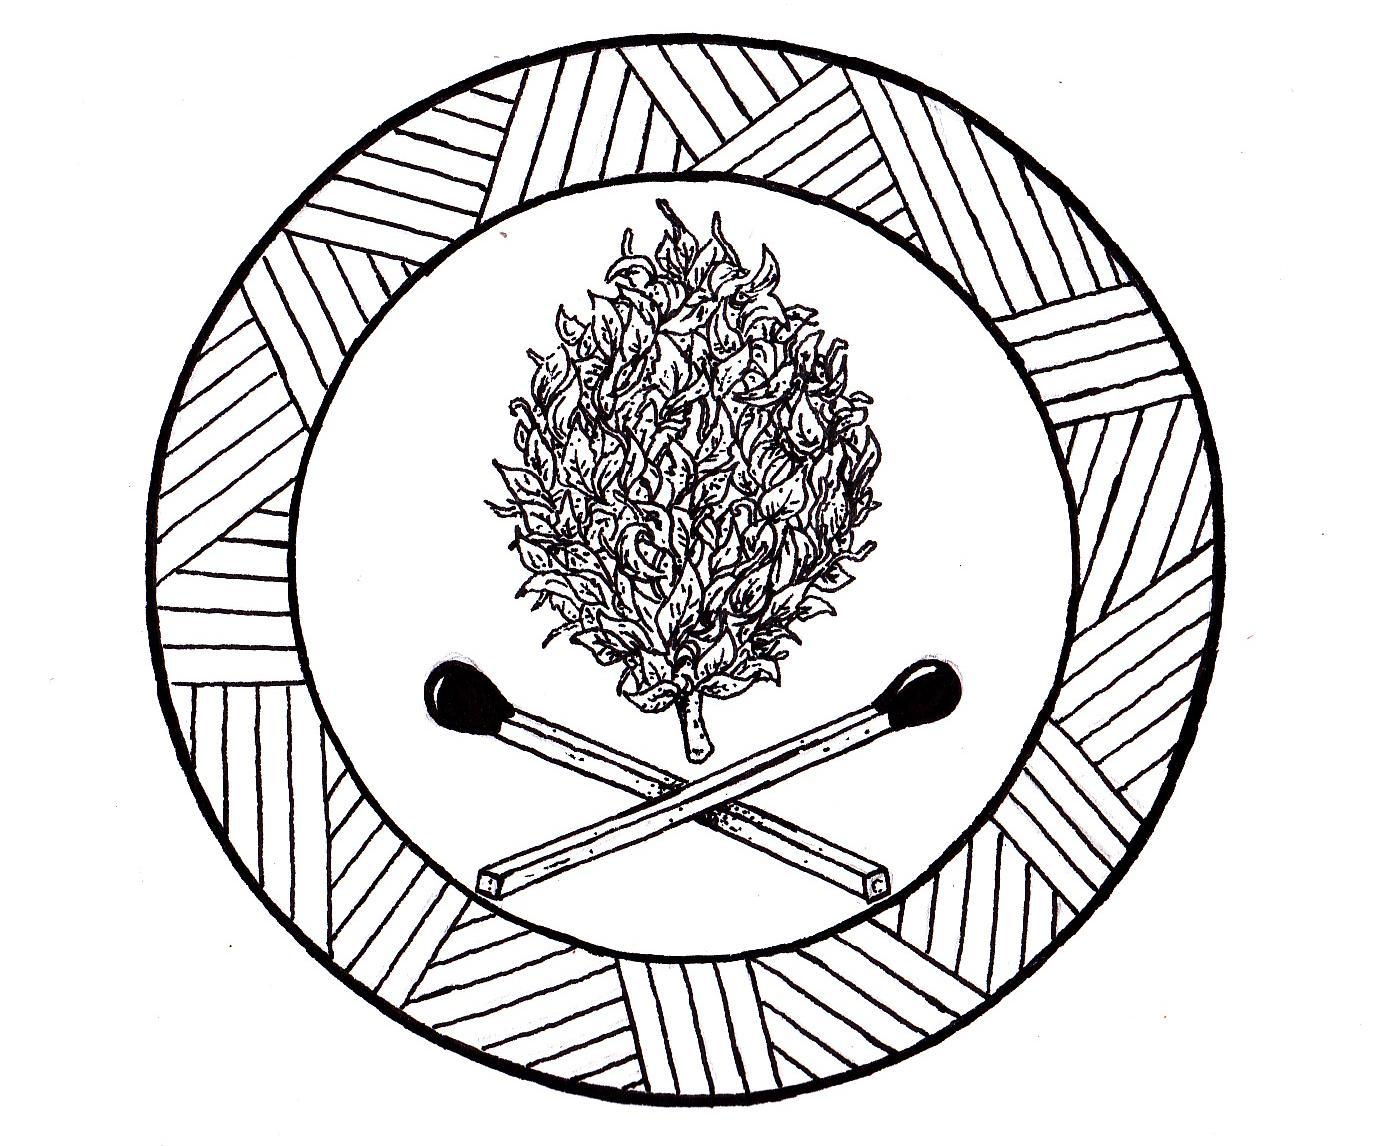 Drawn weed nug Trees : 3 to I